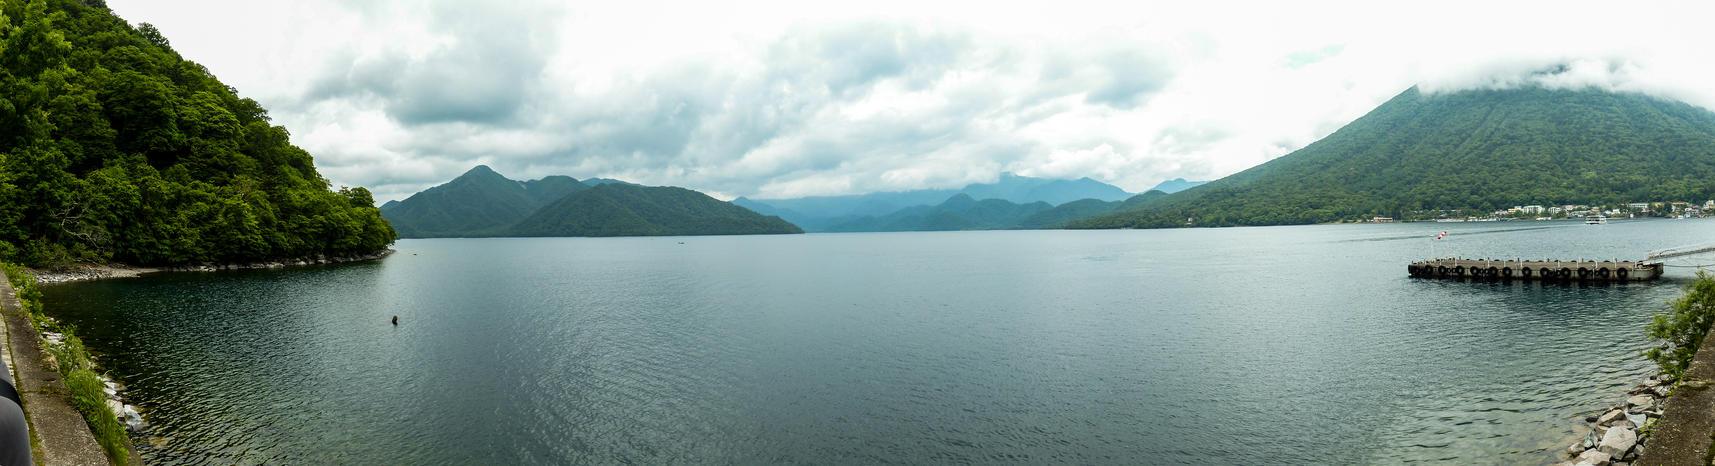 Lake Chuzenji Panorama by MartyMcFly81